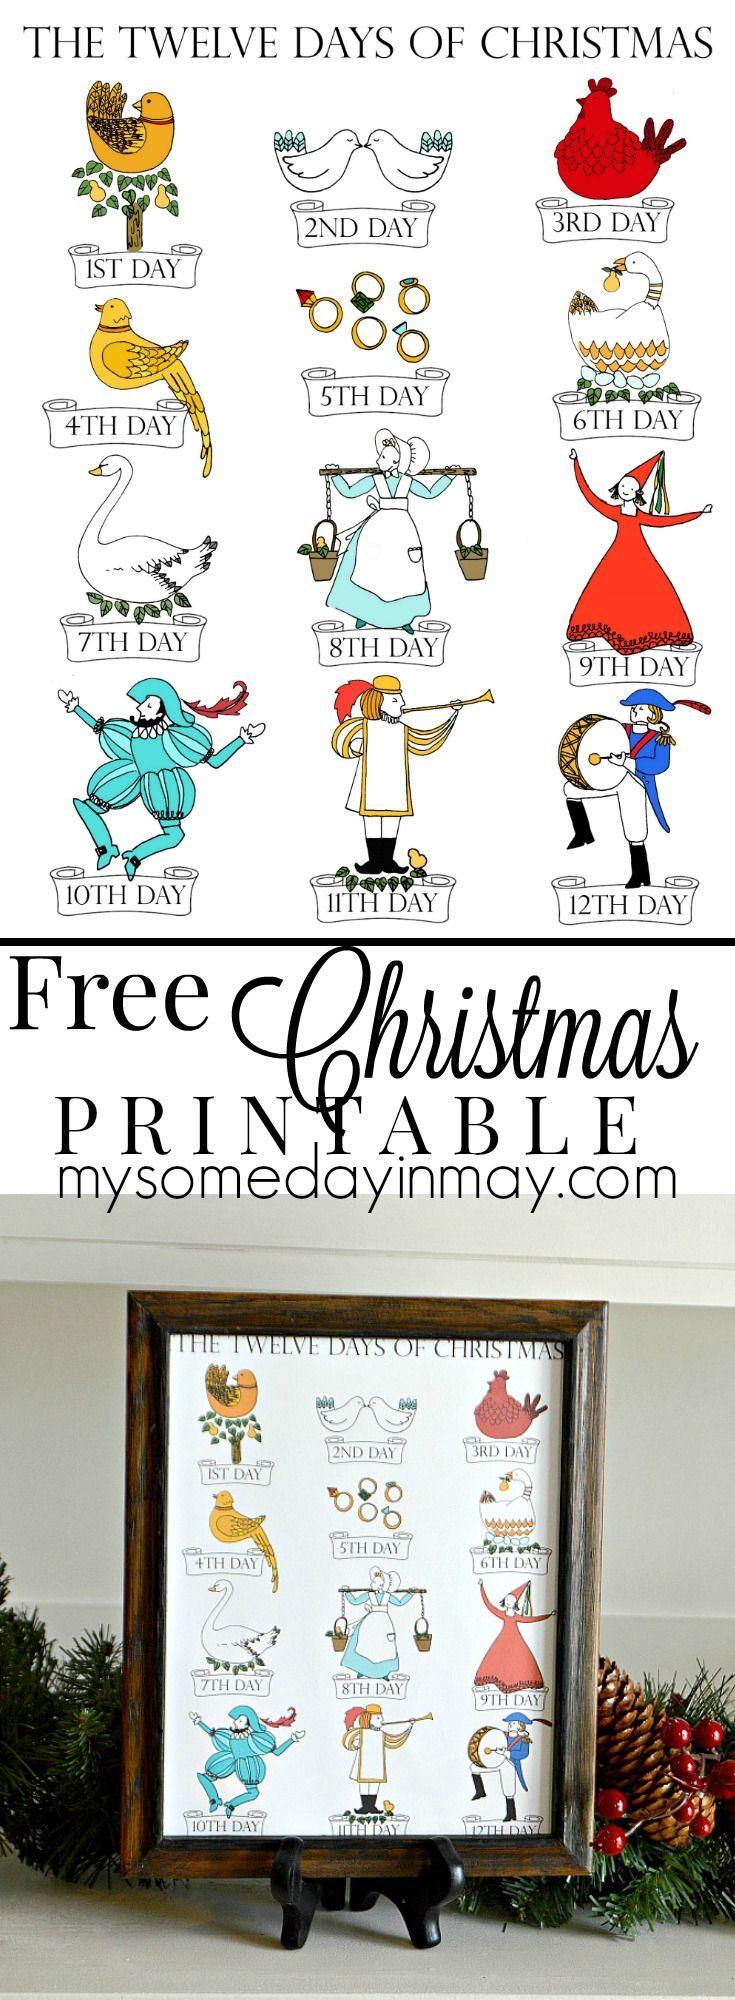 12 Days Of Christmas Craft Ideas Part - 18: 12 Days Of Christmas Free Printable!